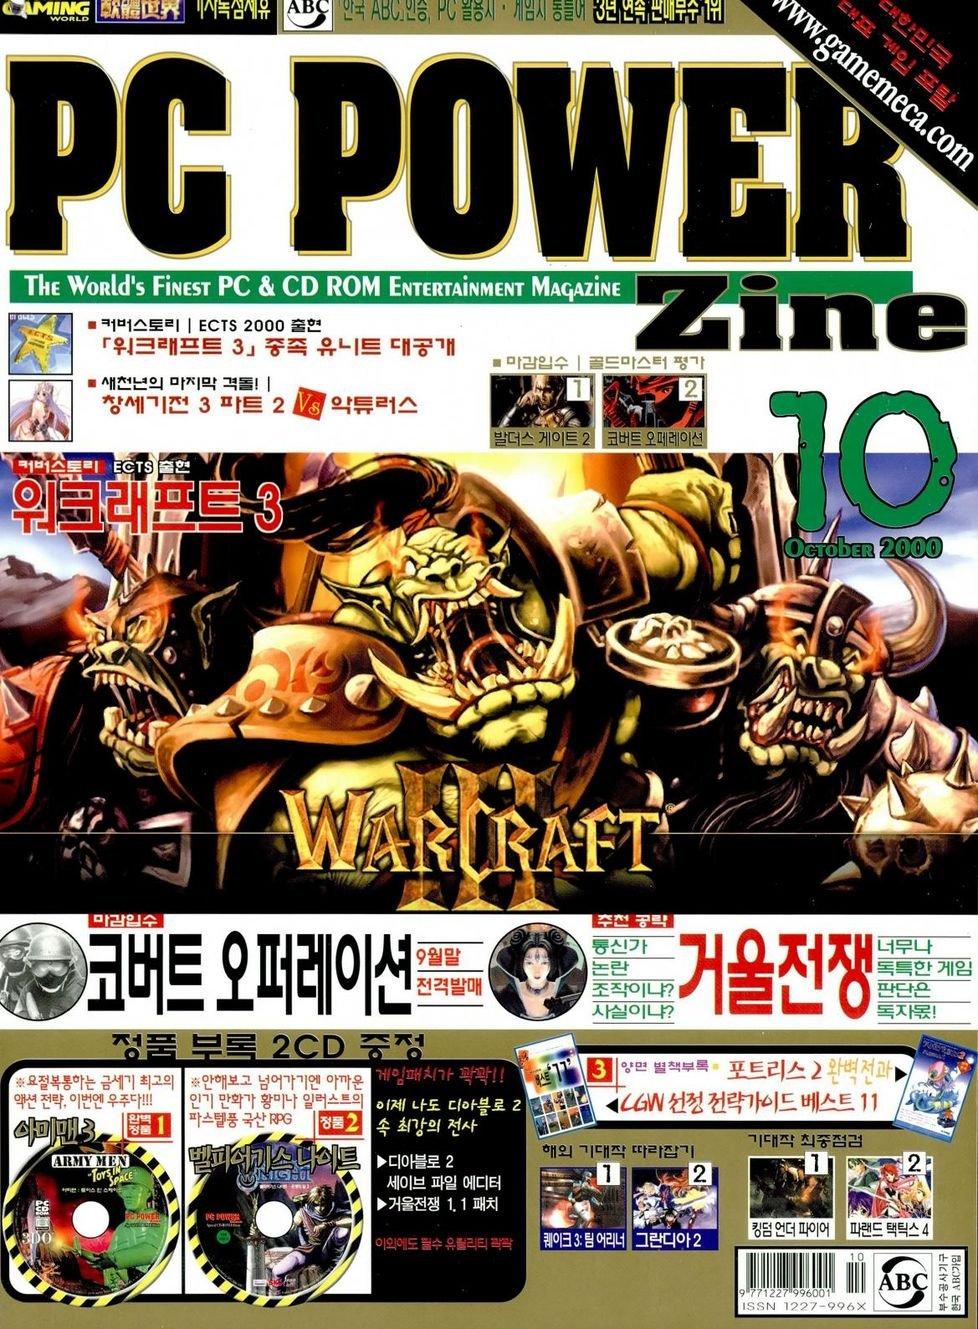 PC Power Zine Issue 63 (October 2000)